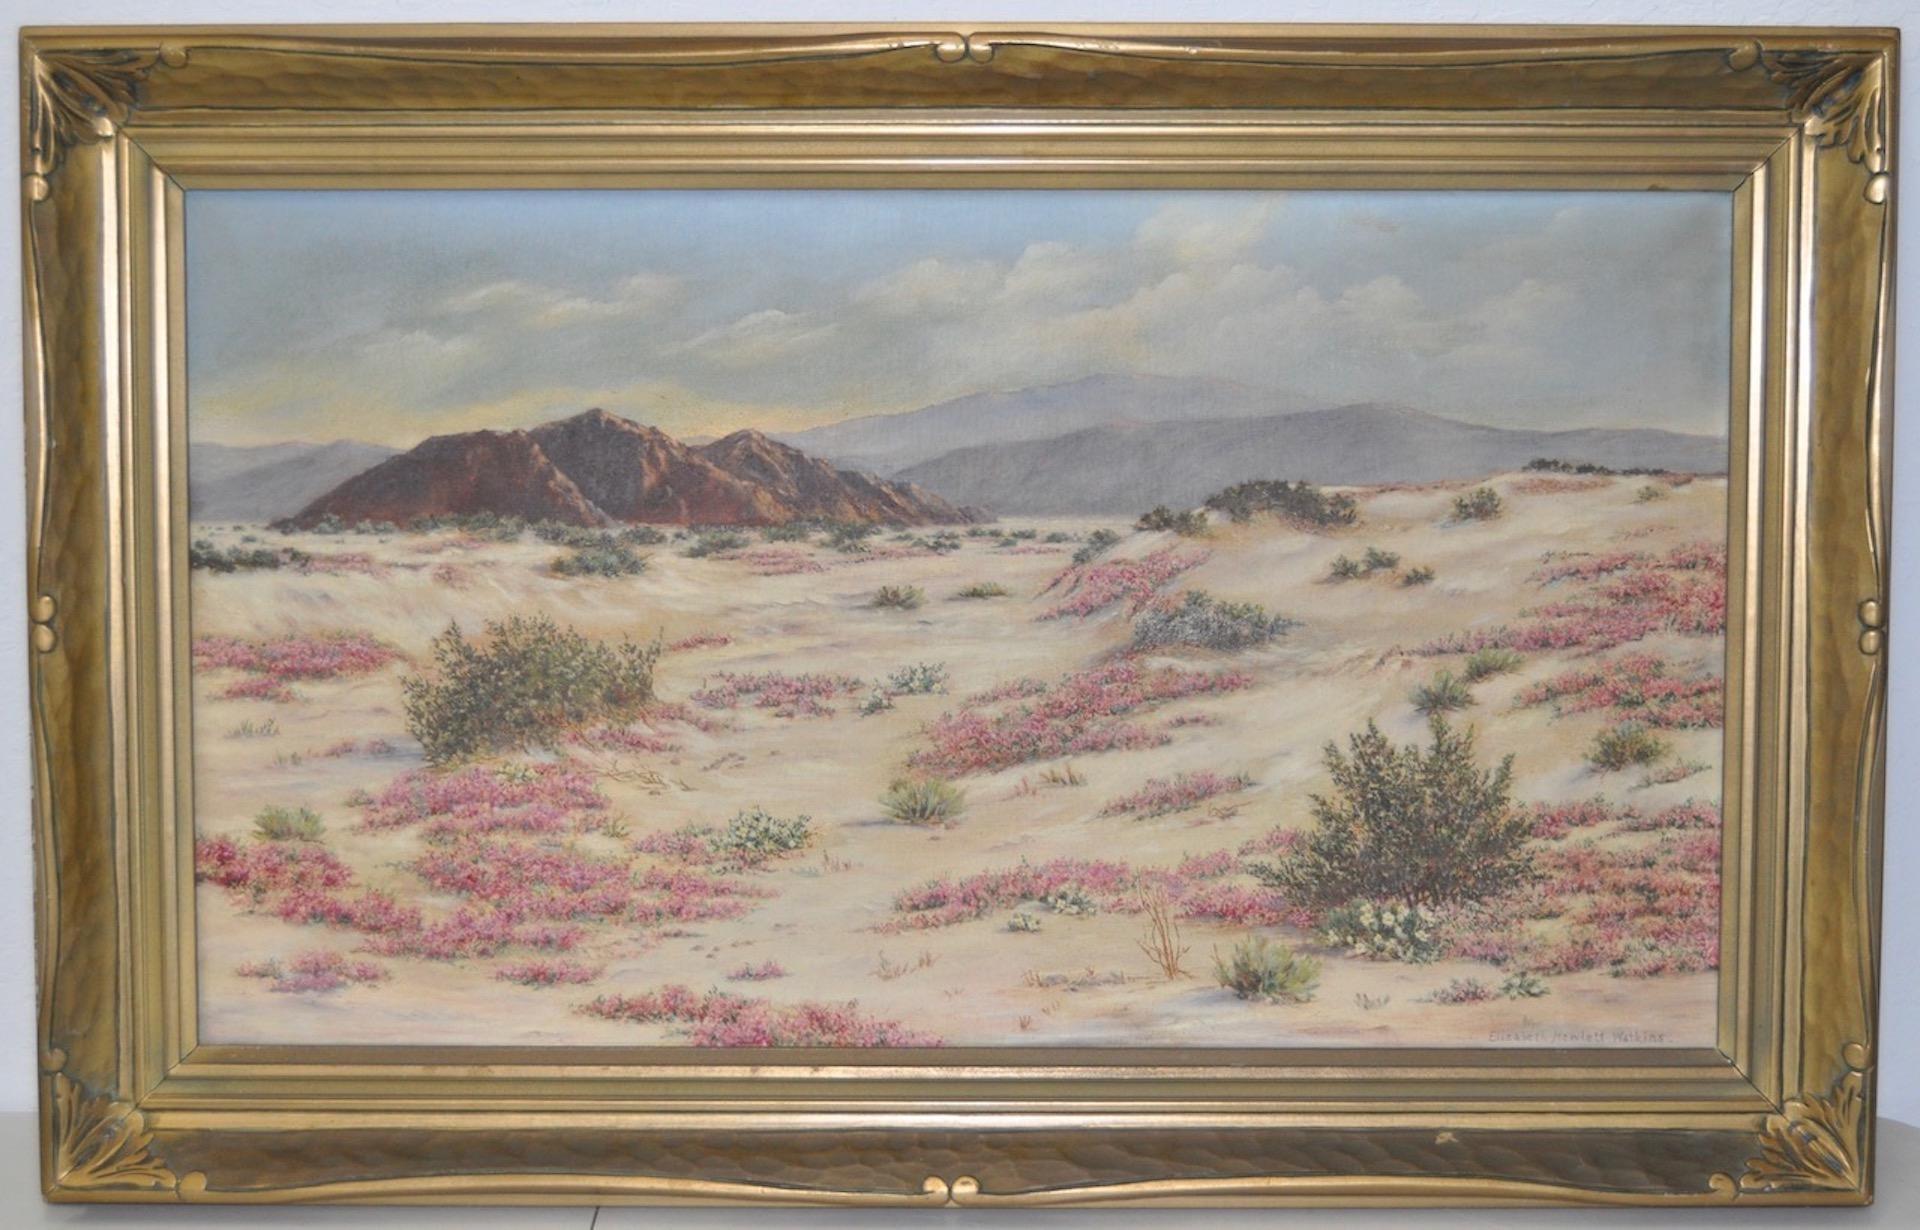 California Desert Landscape w/ Sand Verbena by Elizabeth Hewlett Watkins c.1940s